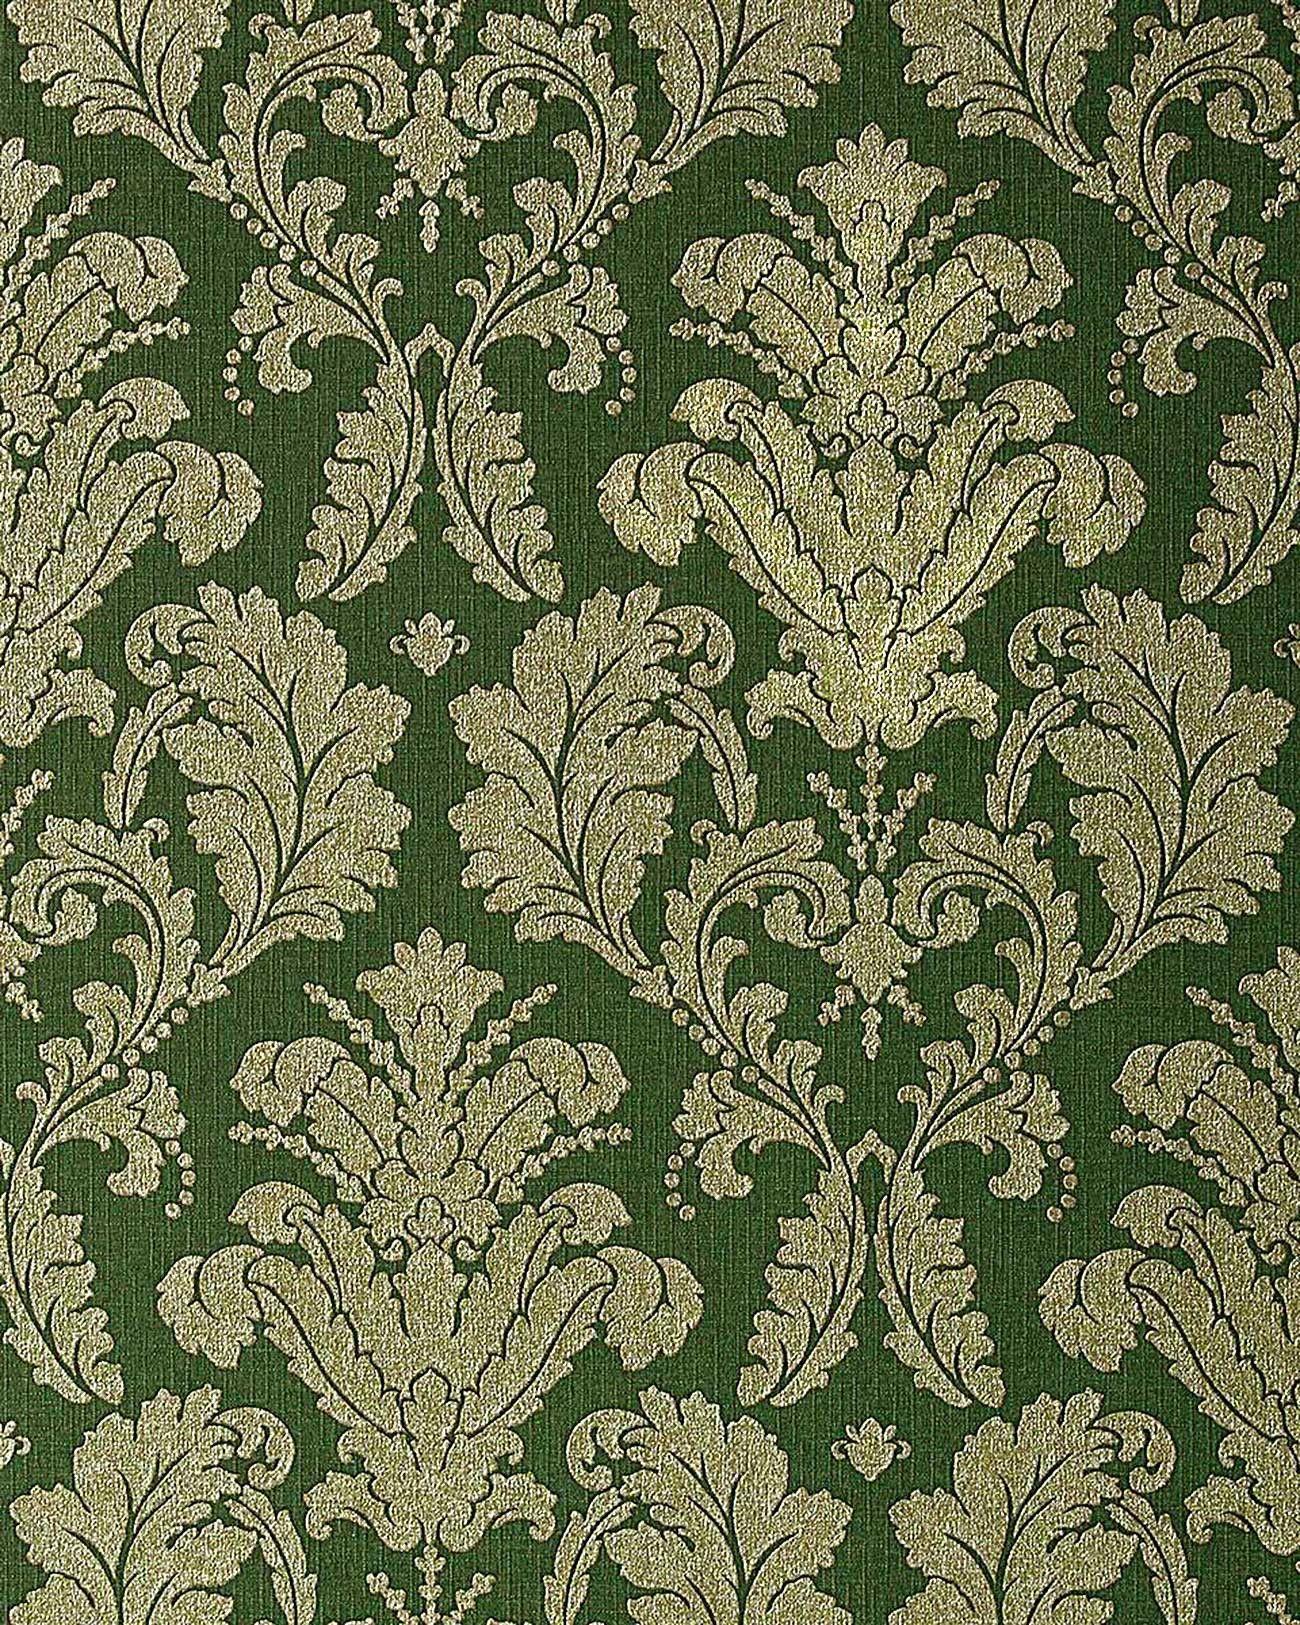 Carta Da Parati Stile Barocco.771 Tapete 752 38 Jpg 1300 1625 Gold Room Decor Vinyl Wallpaper Damask